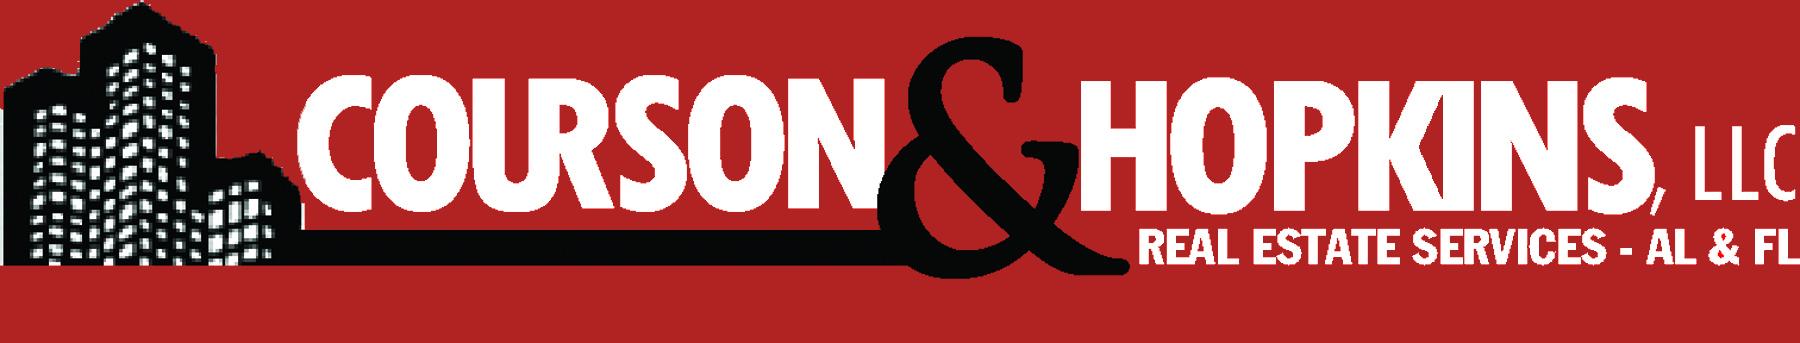 Our Featured Listings | Becky Courson & Jill Prevett | 334-488-1408